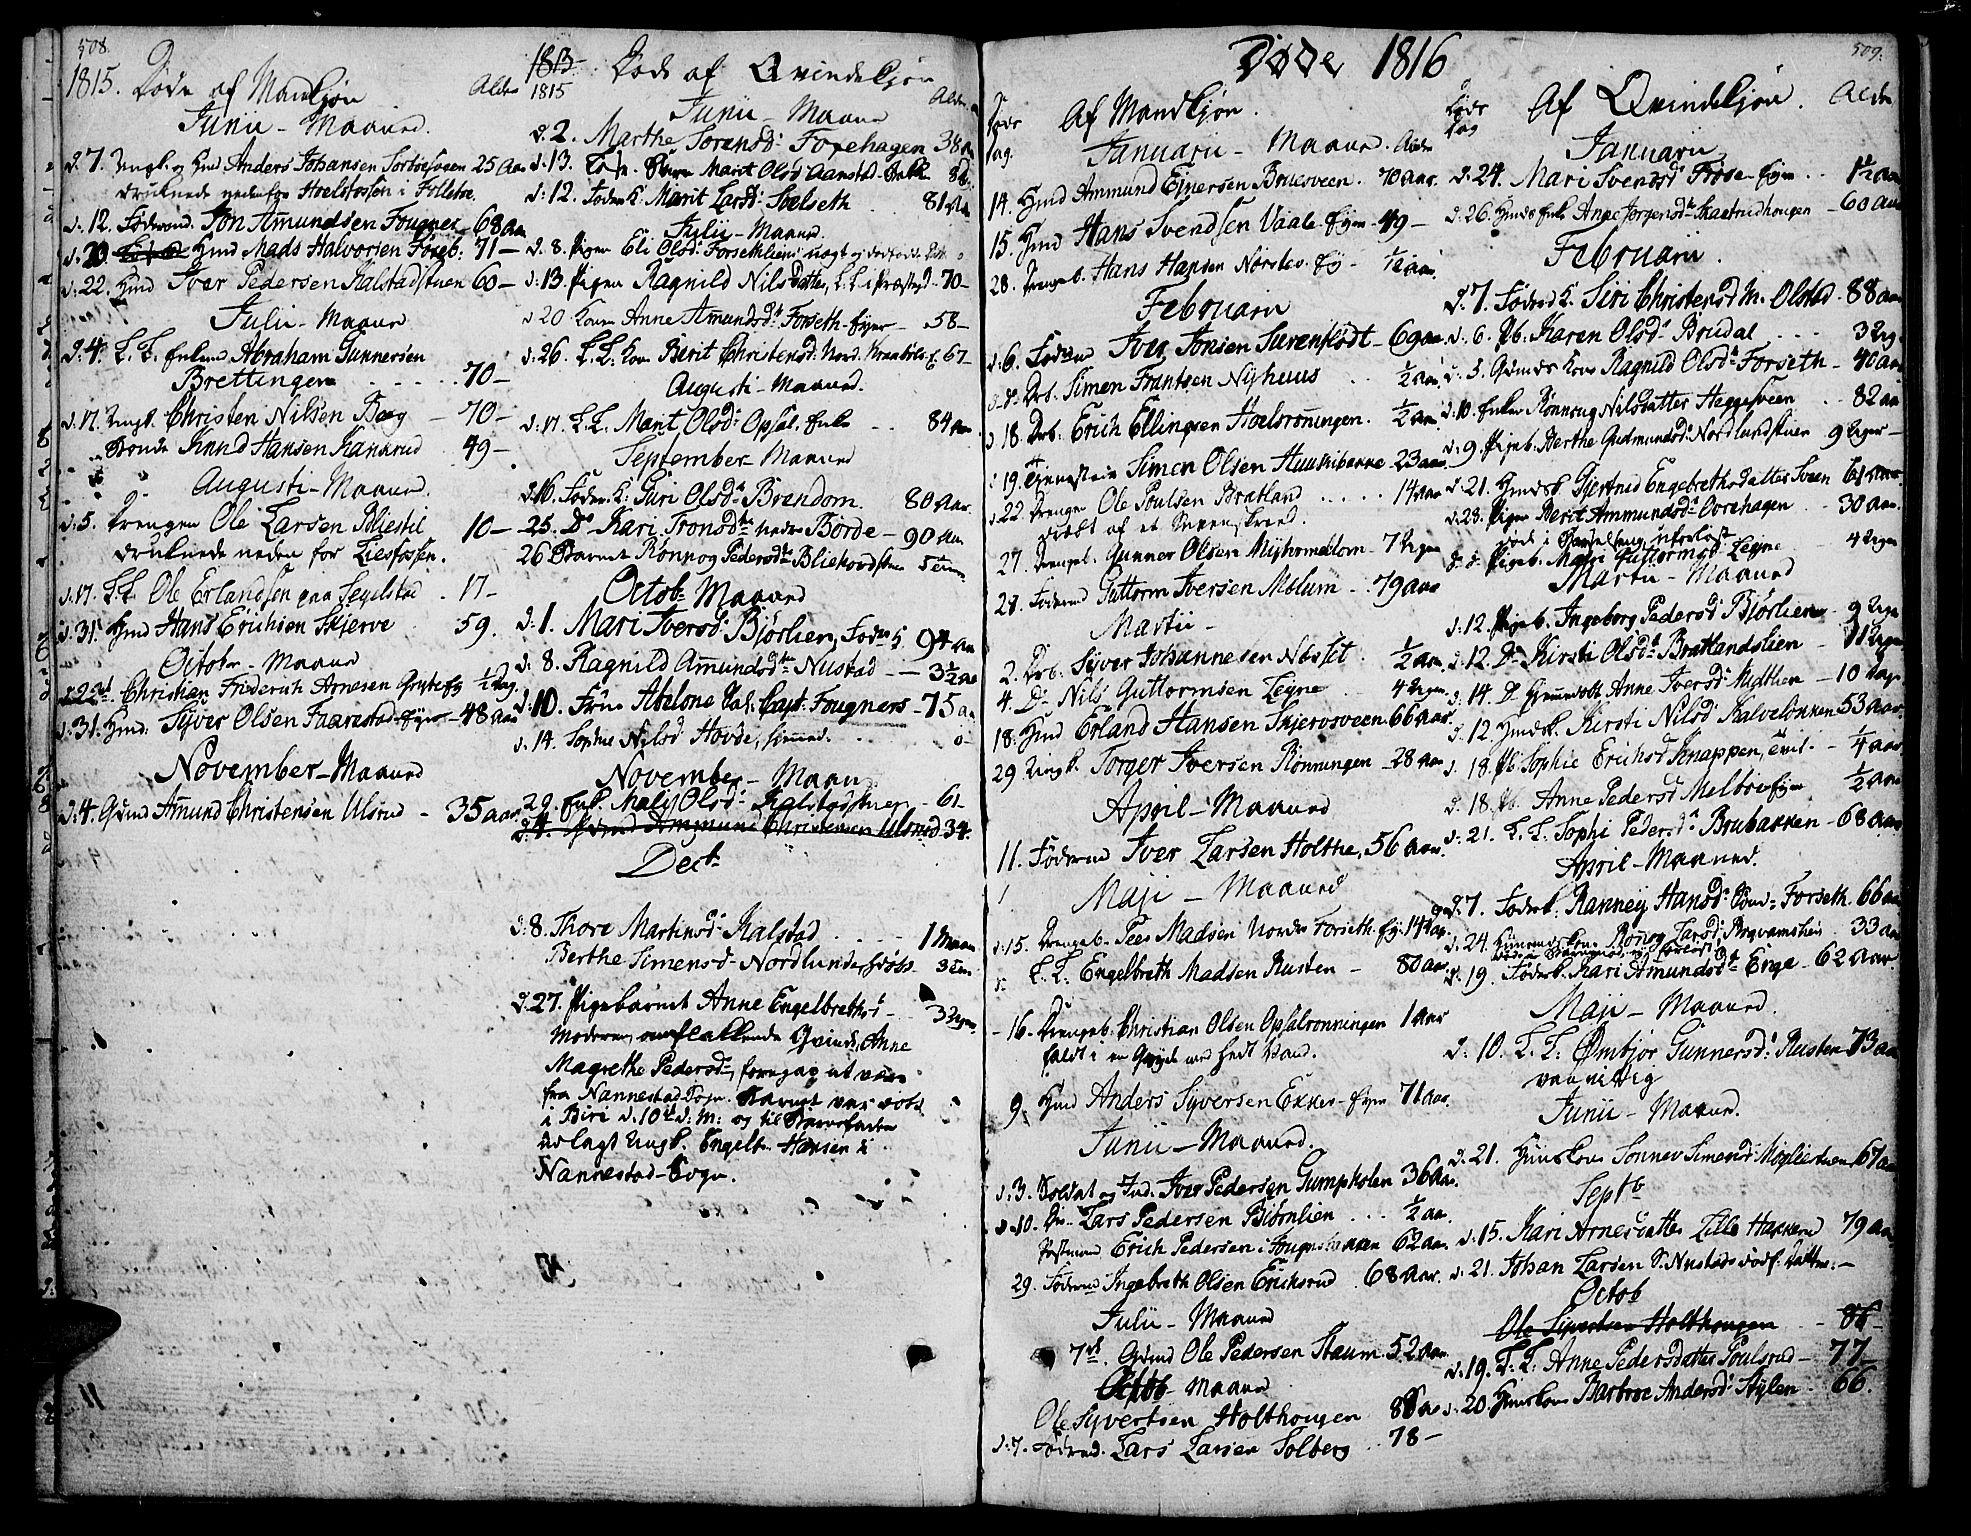 SAH, Gausdal prestekontor, Ministerialbok nr. 4, 1809-1817, s. 508-509